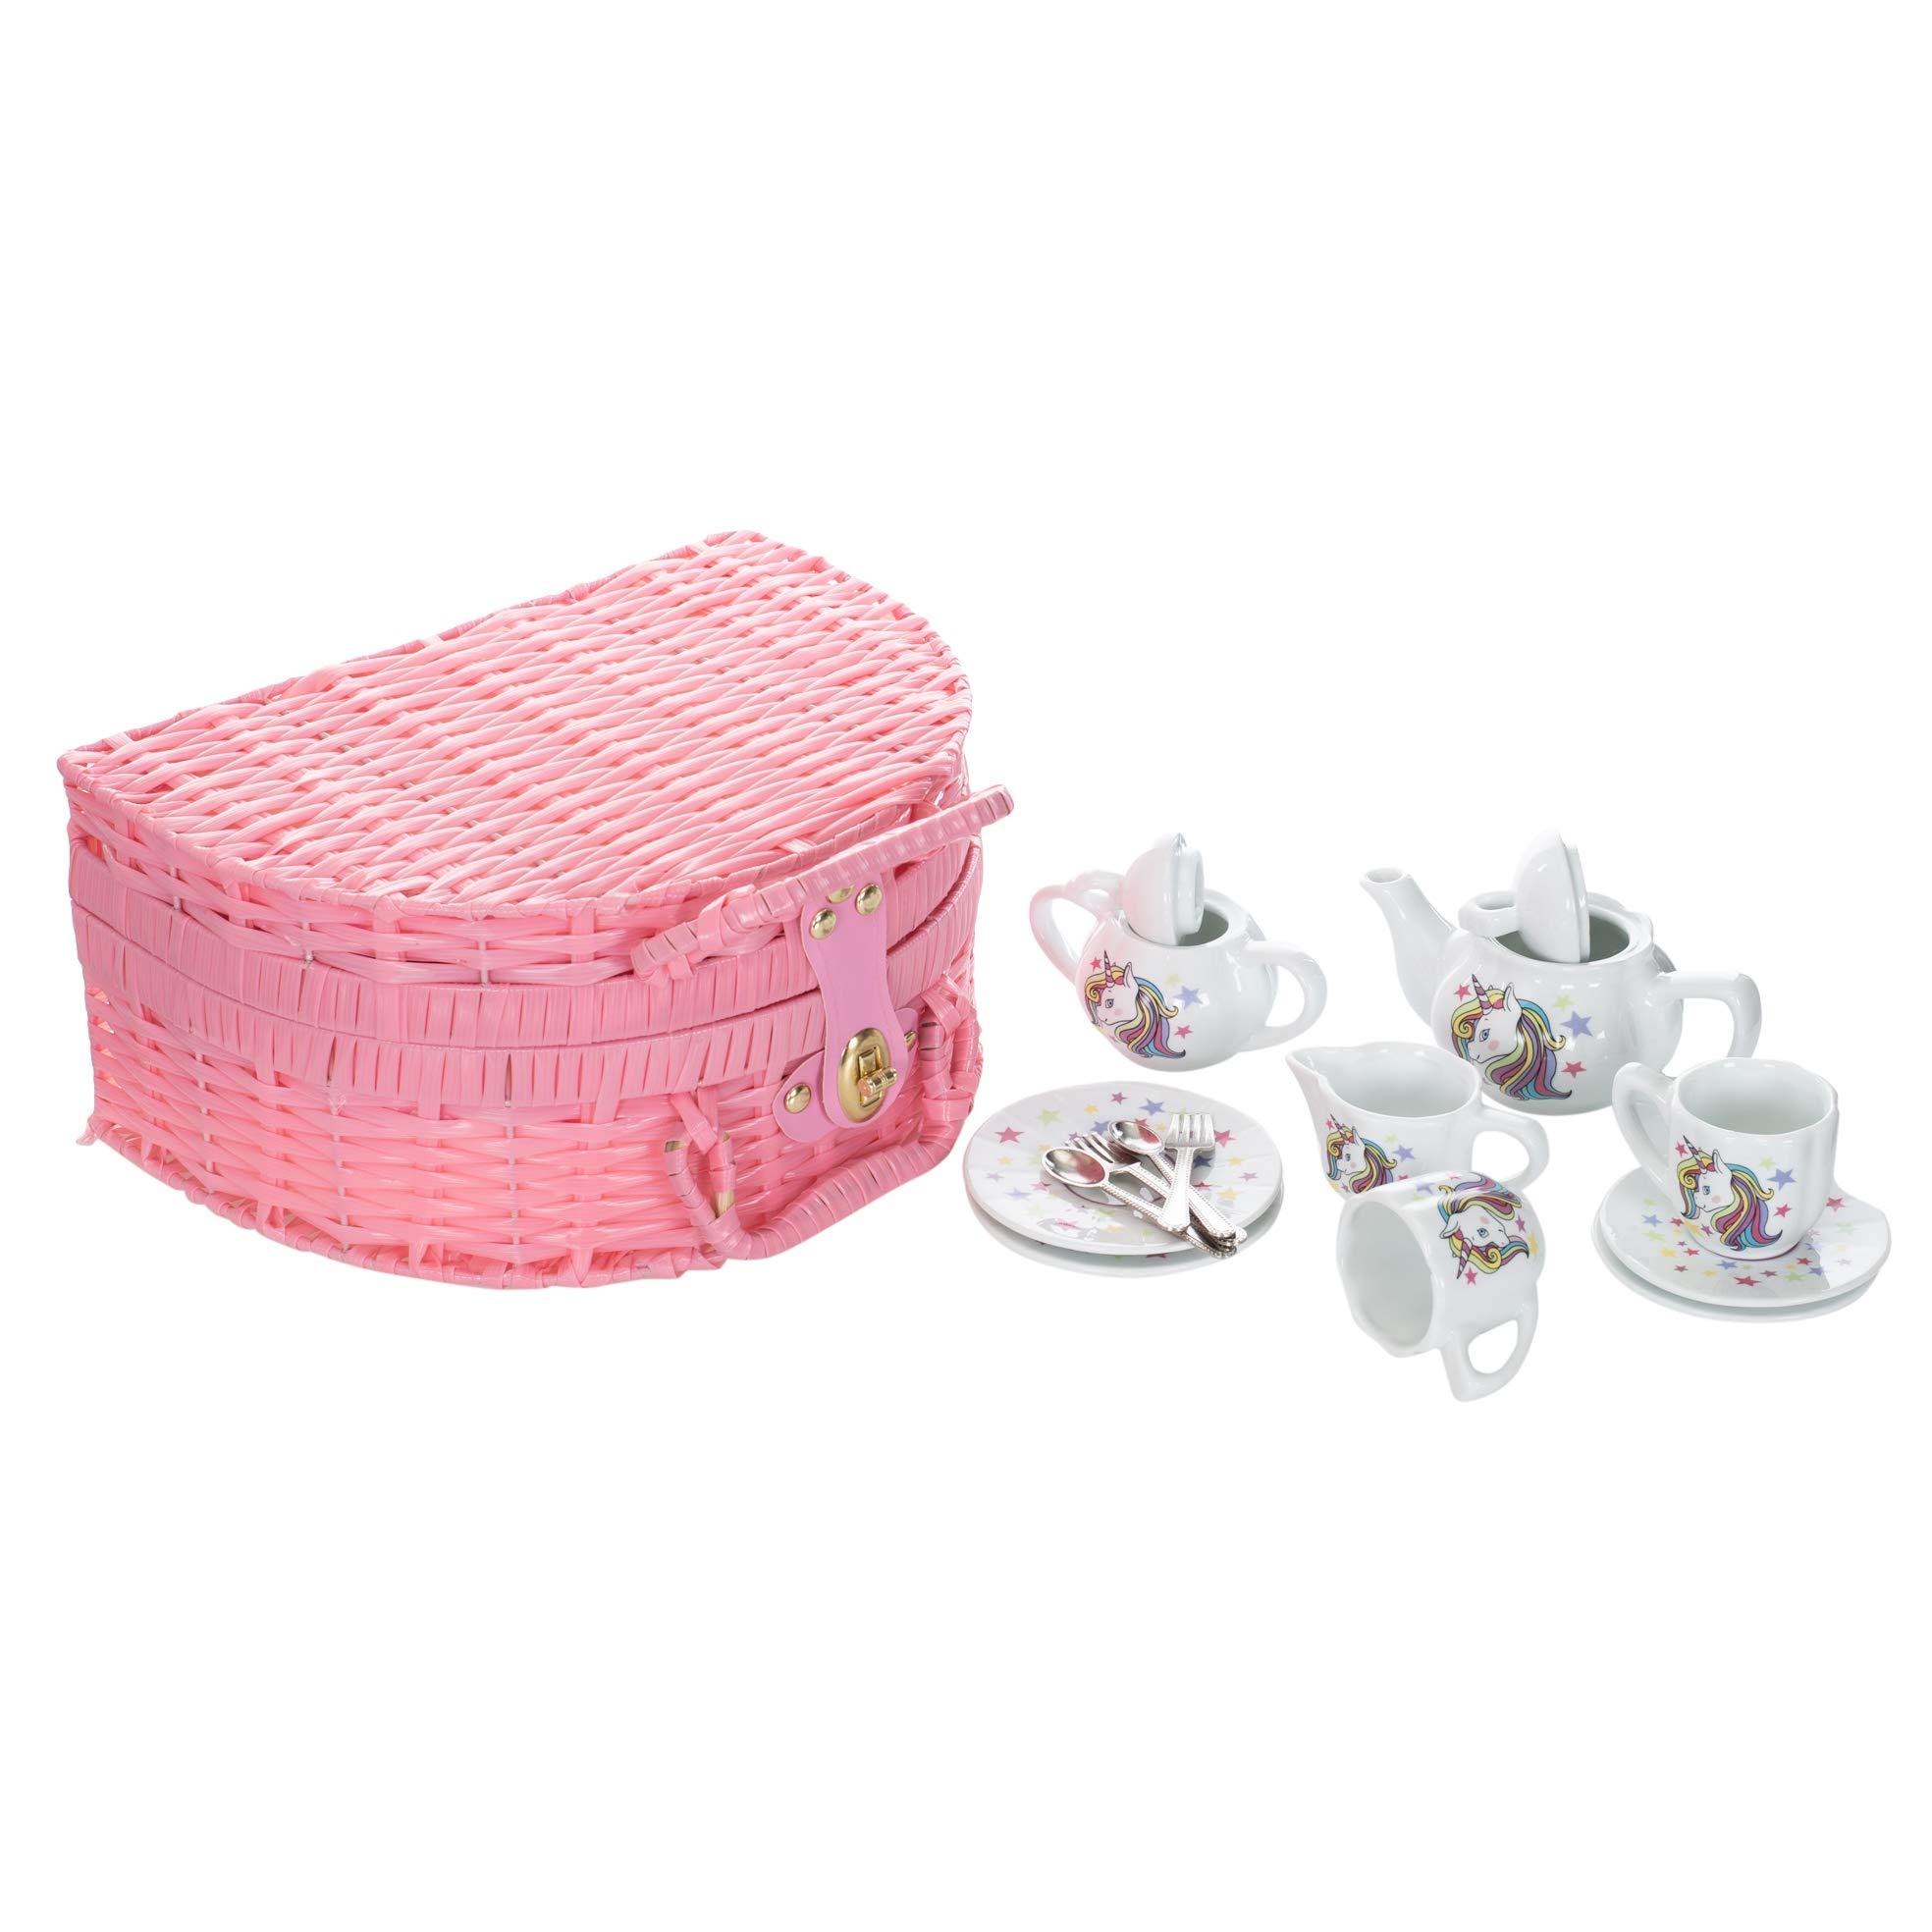 Delton Porcelain Unicorn Tea Set in Basket